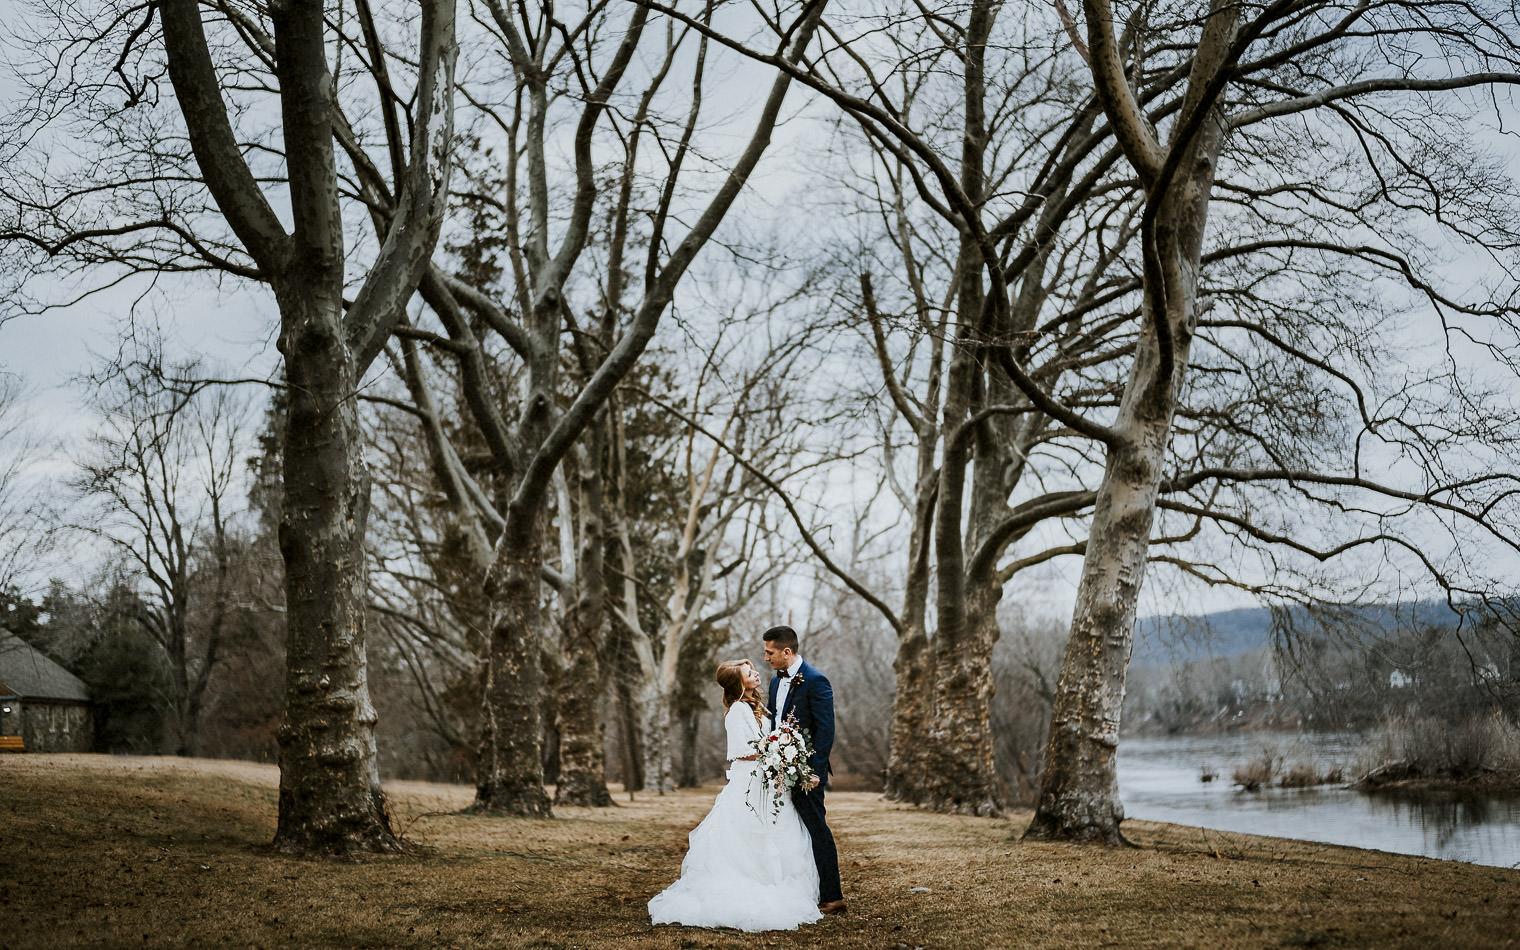 Jay-Cassario-Leica-Wedding-22.jpg